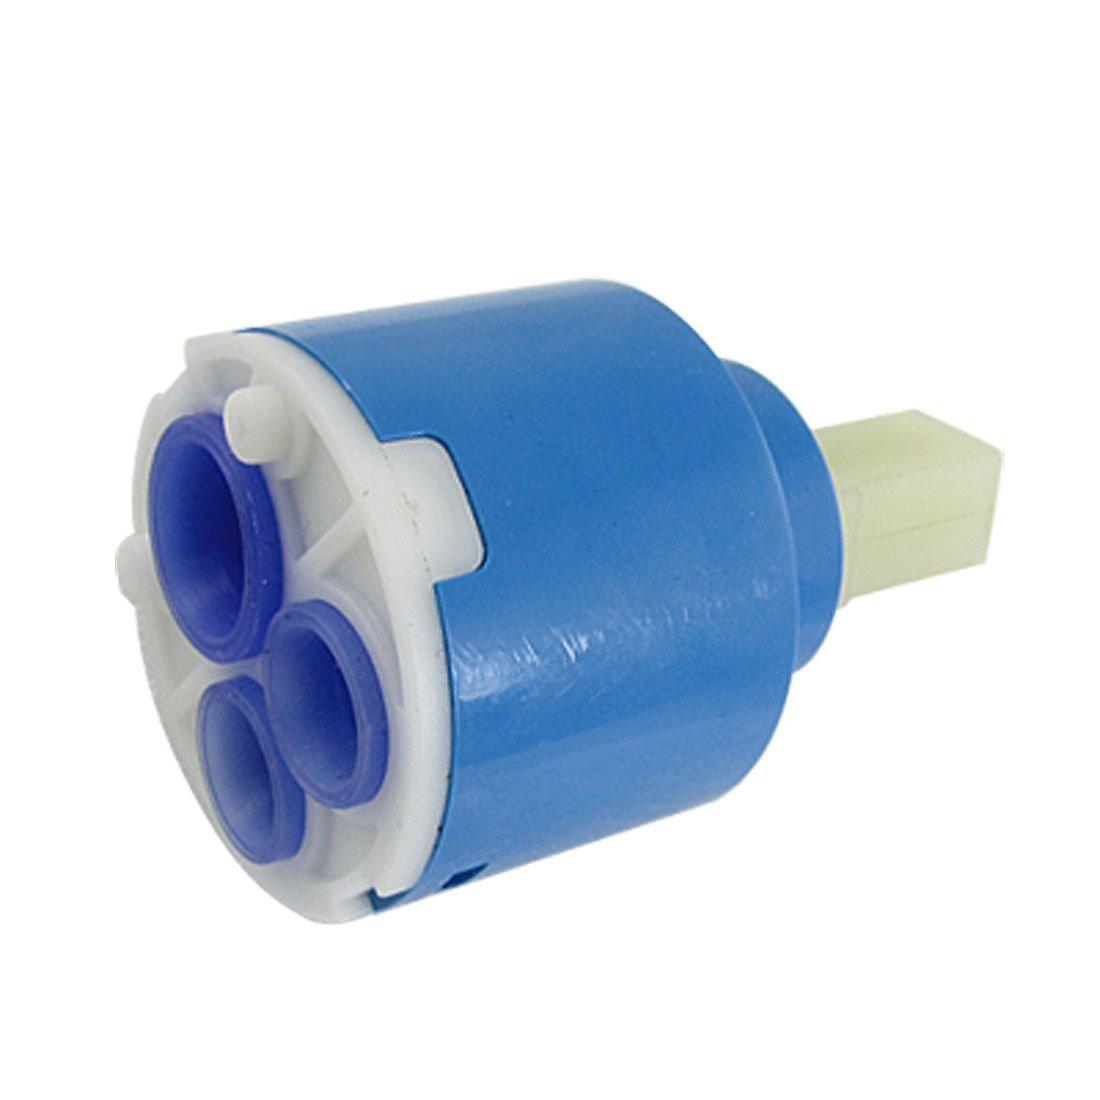 Xigeapg Faucet Water Tap Faucets Ceramic Cartridge Valve Blue